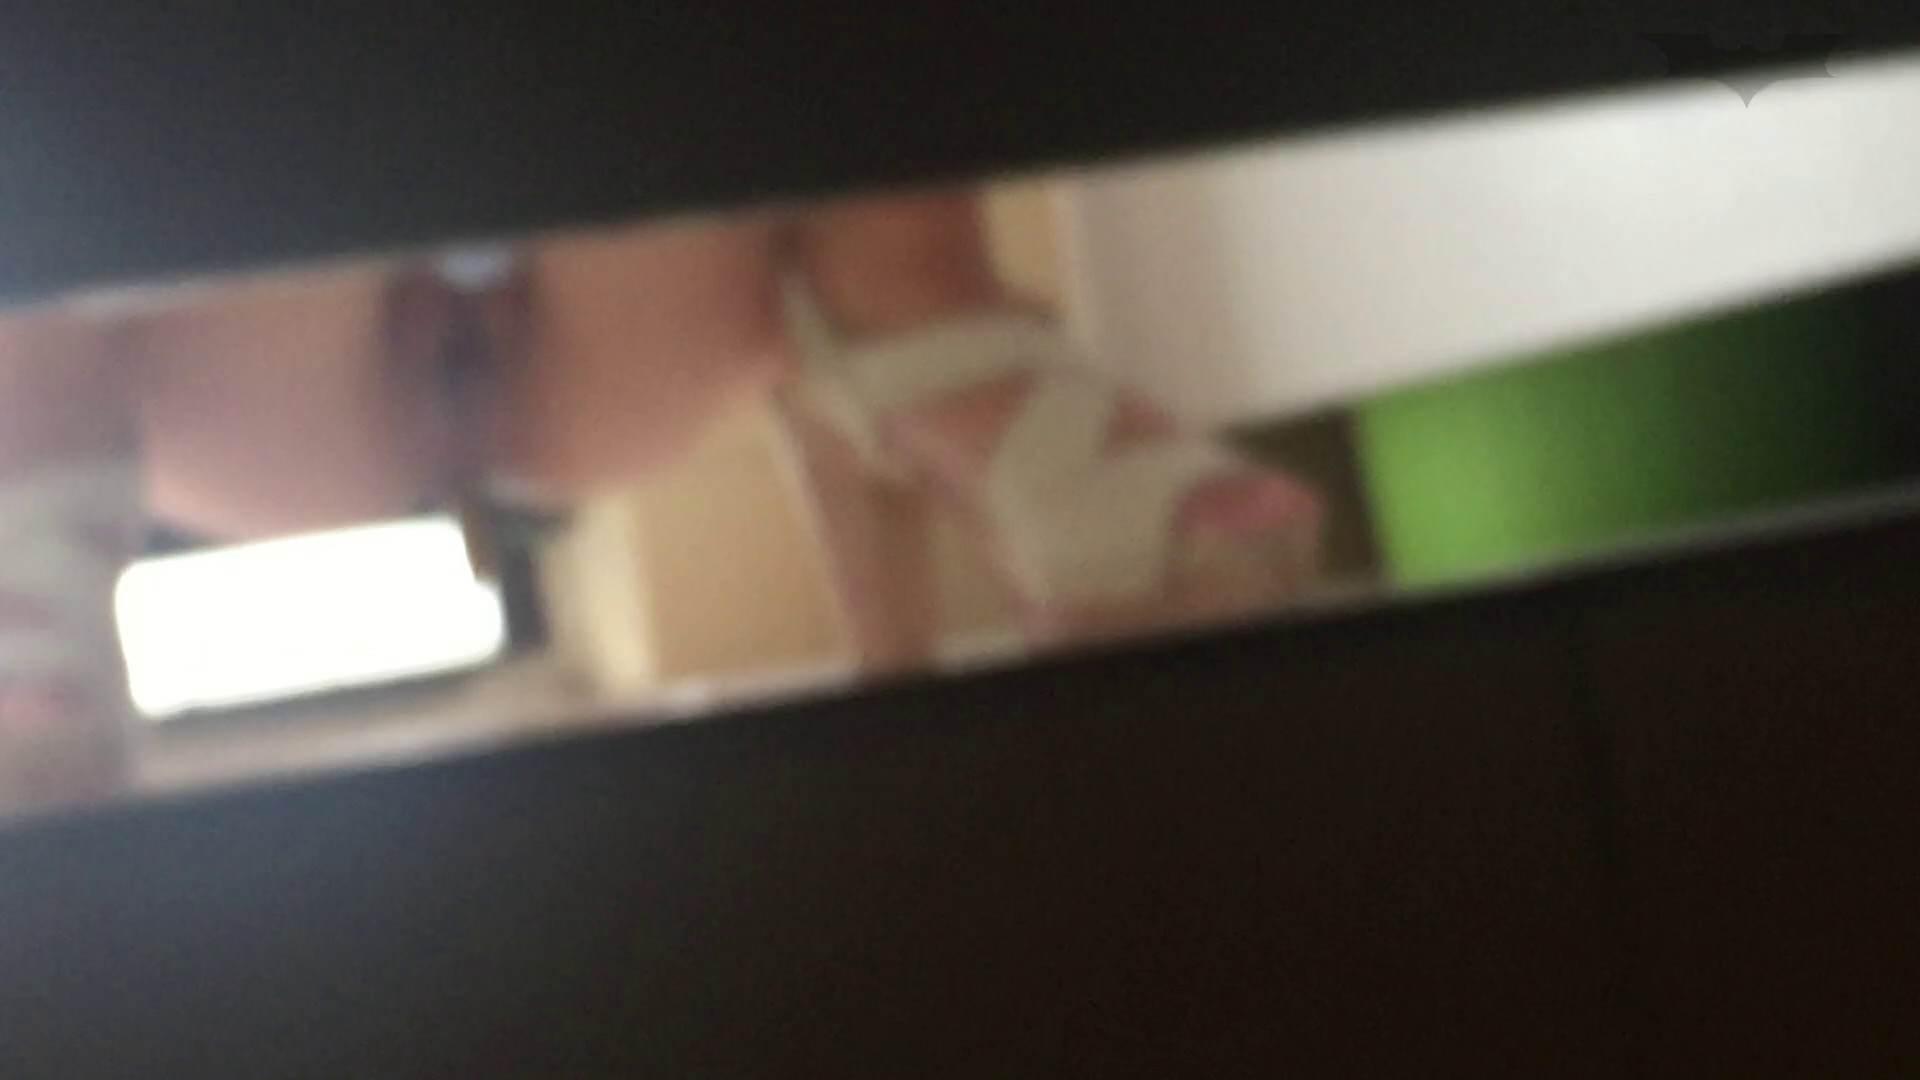 JD盗撮 美女の洗面所の秘密 Vol.73 高画質 ぱこり動画紹介 105画像 97